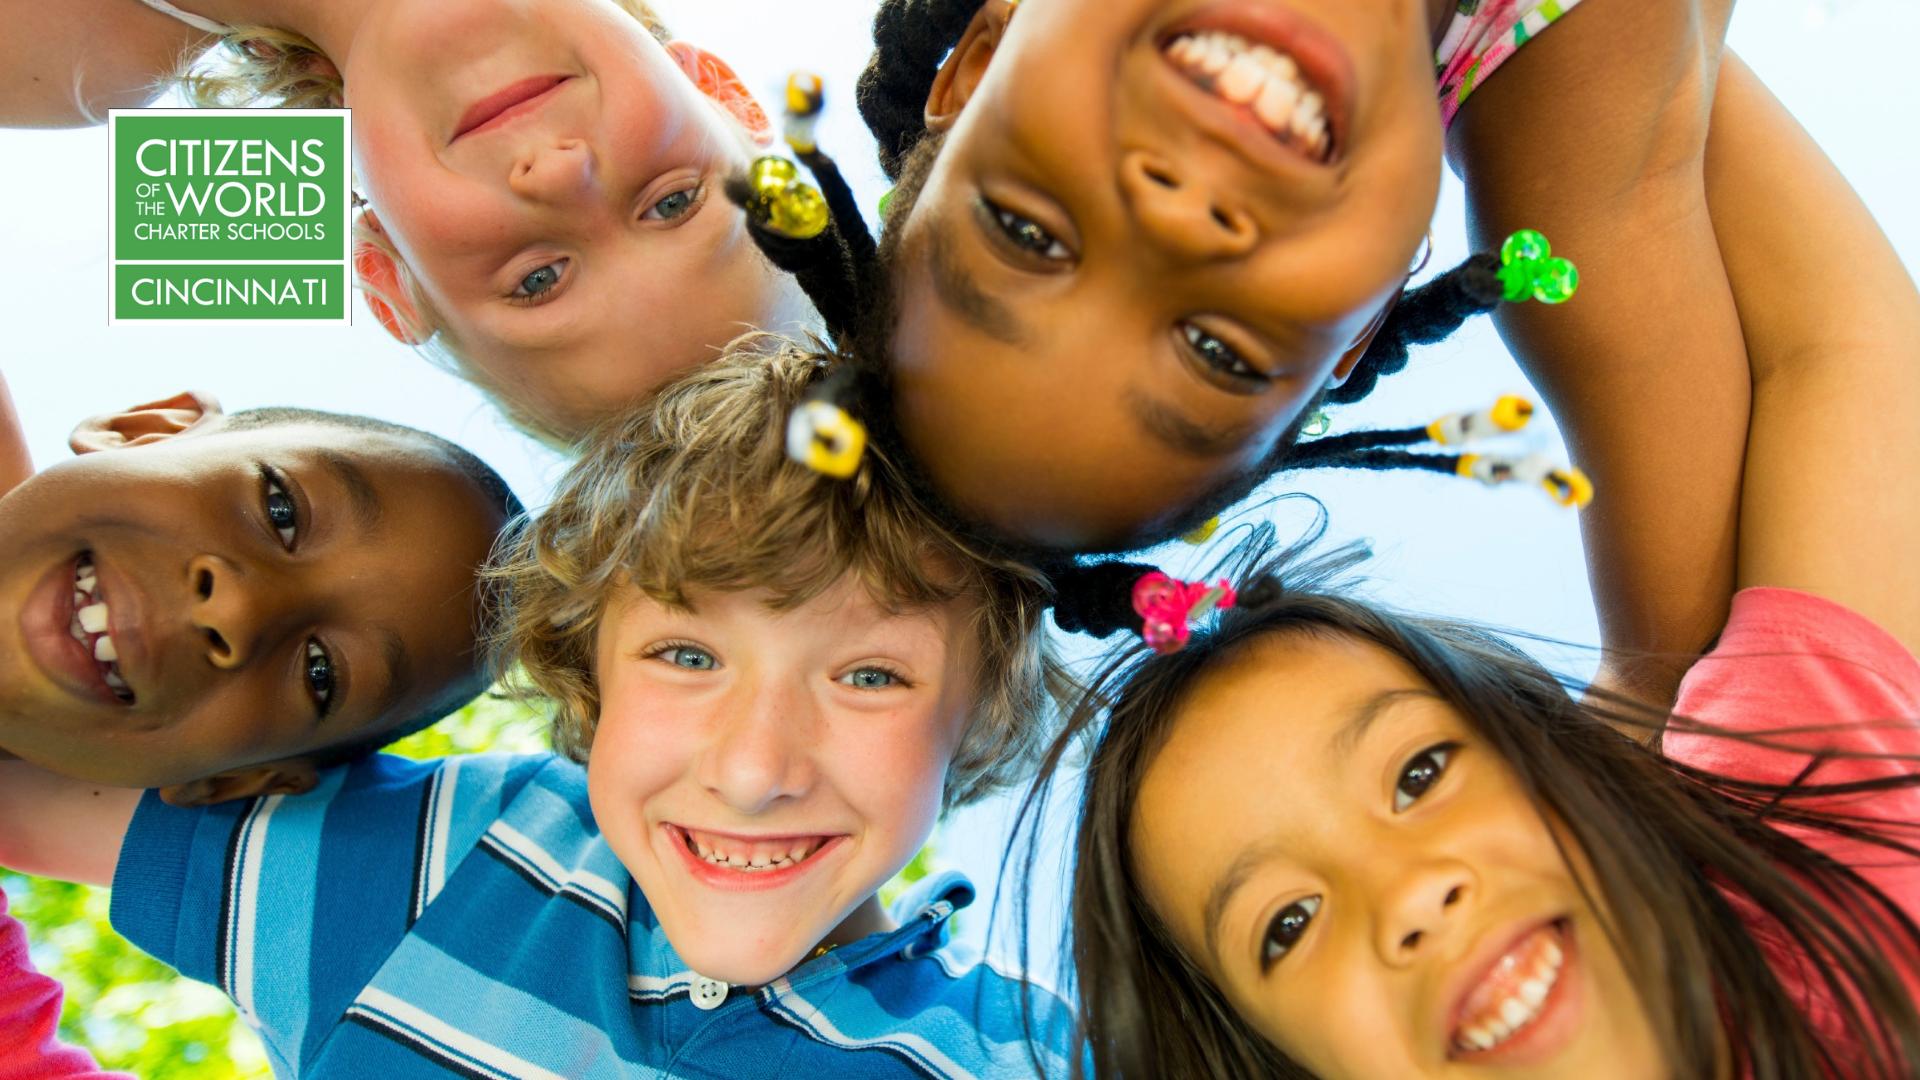 Citizens of the World Charter Schools Cincinnati